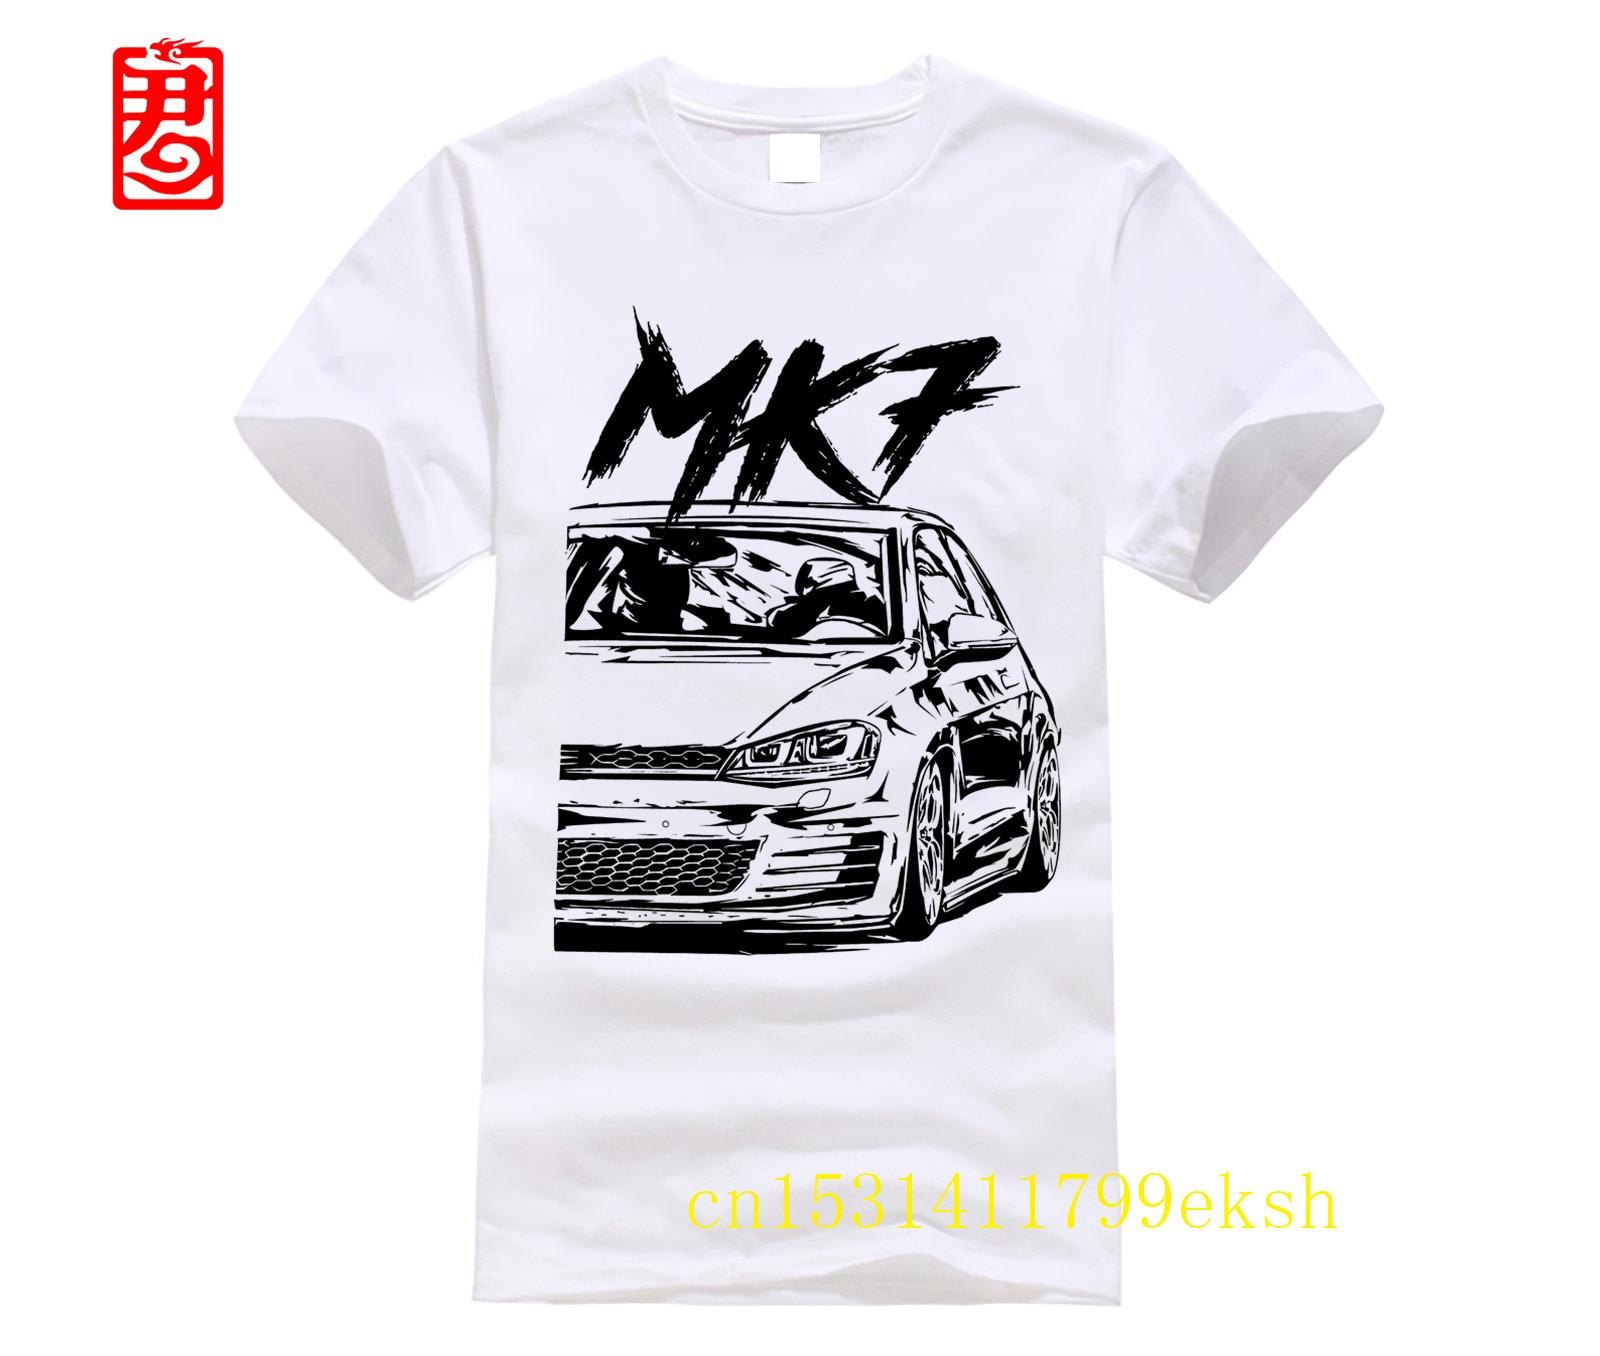 7 MK7 GTI Clubsport camisa (meliert) Mercedes|Camisetas|   - AliExpress